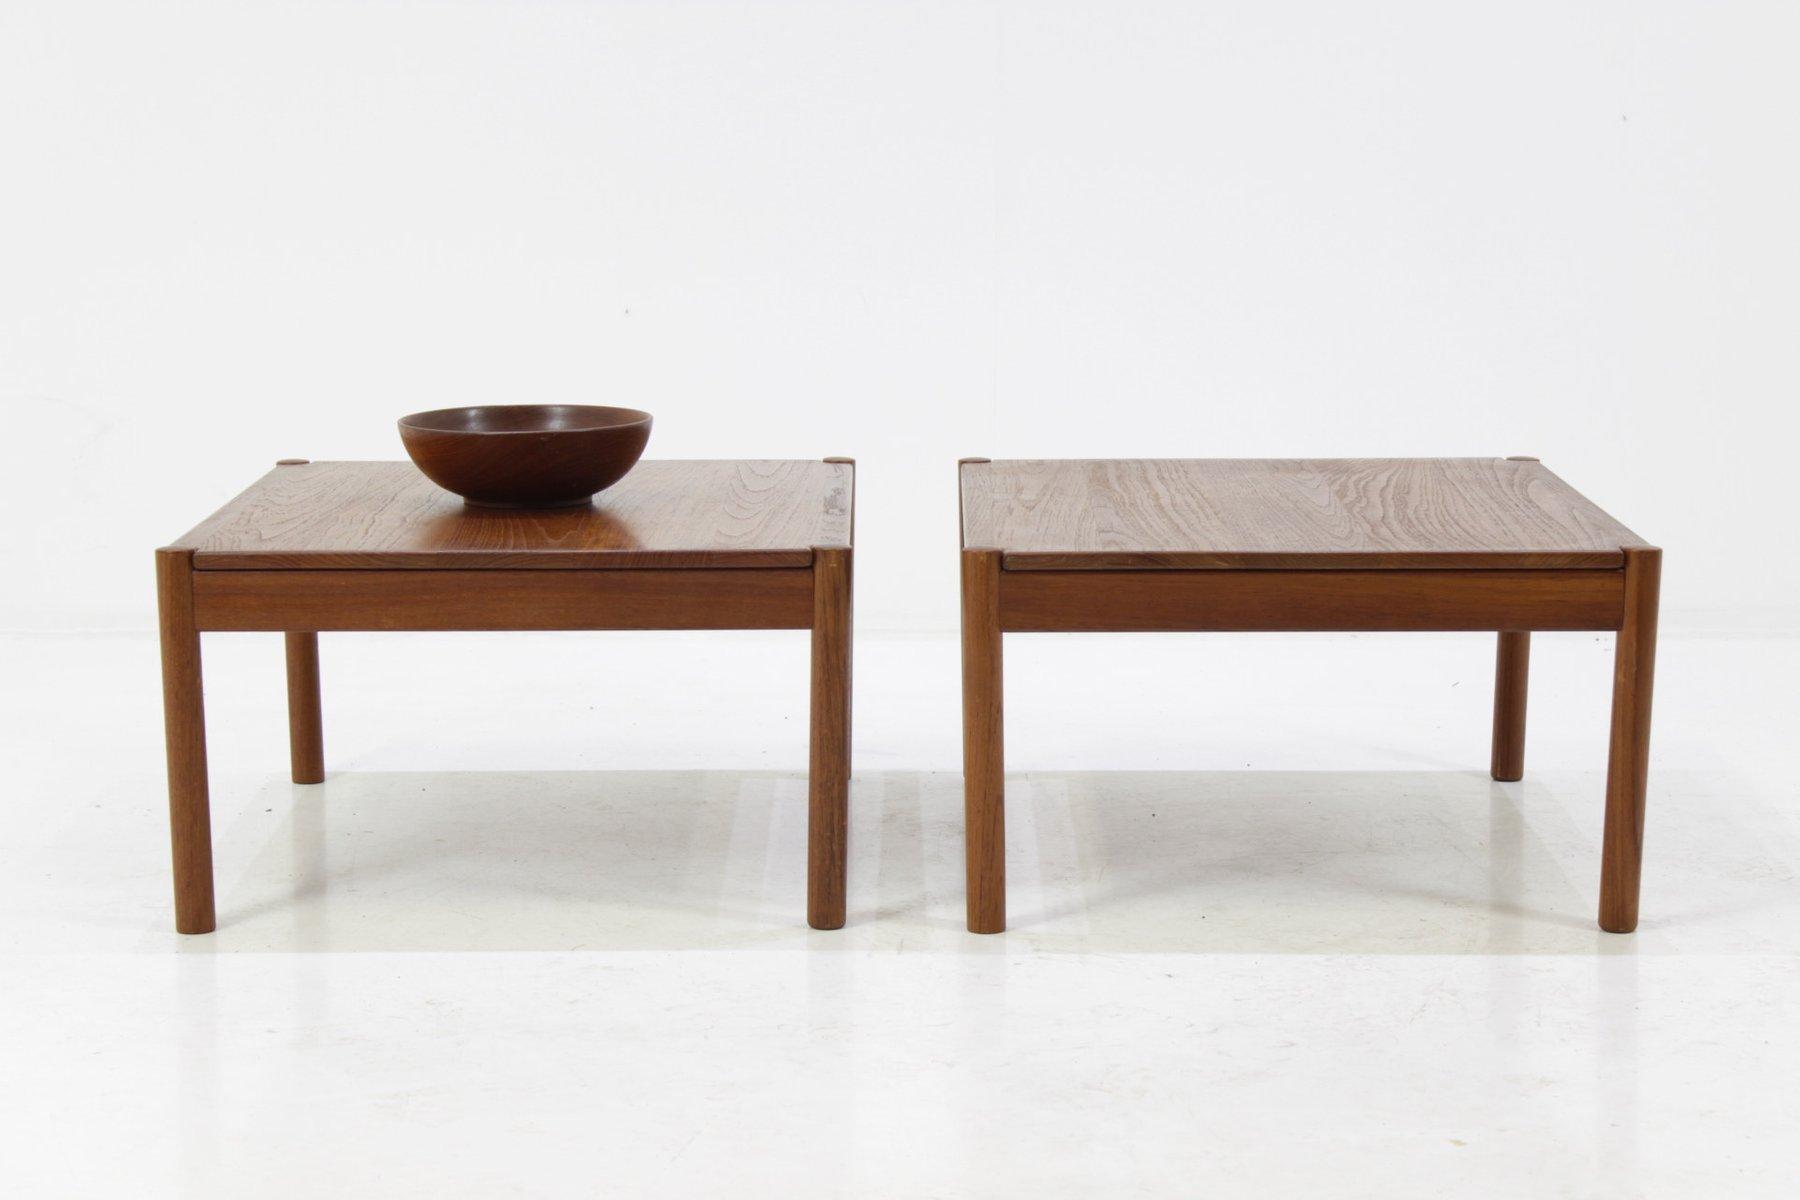 Solid Teak Coffee Tables by Magnus Olesen for Durum 1960s Set of